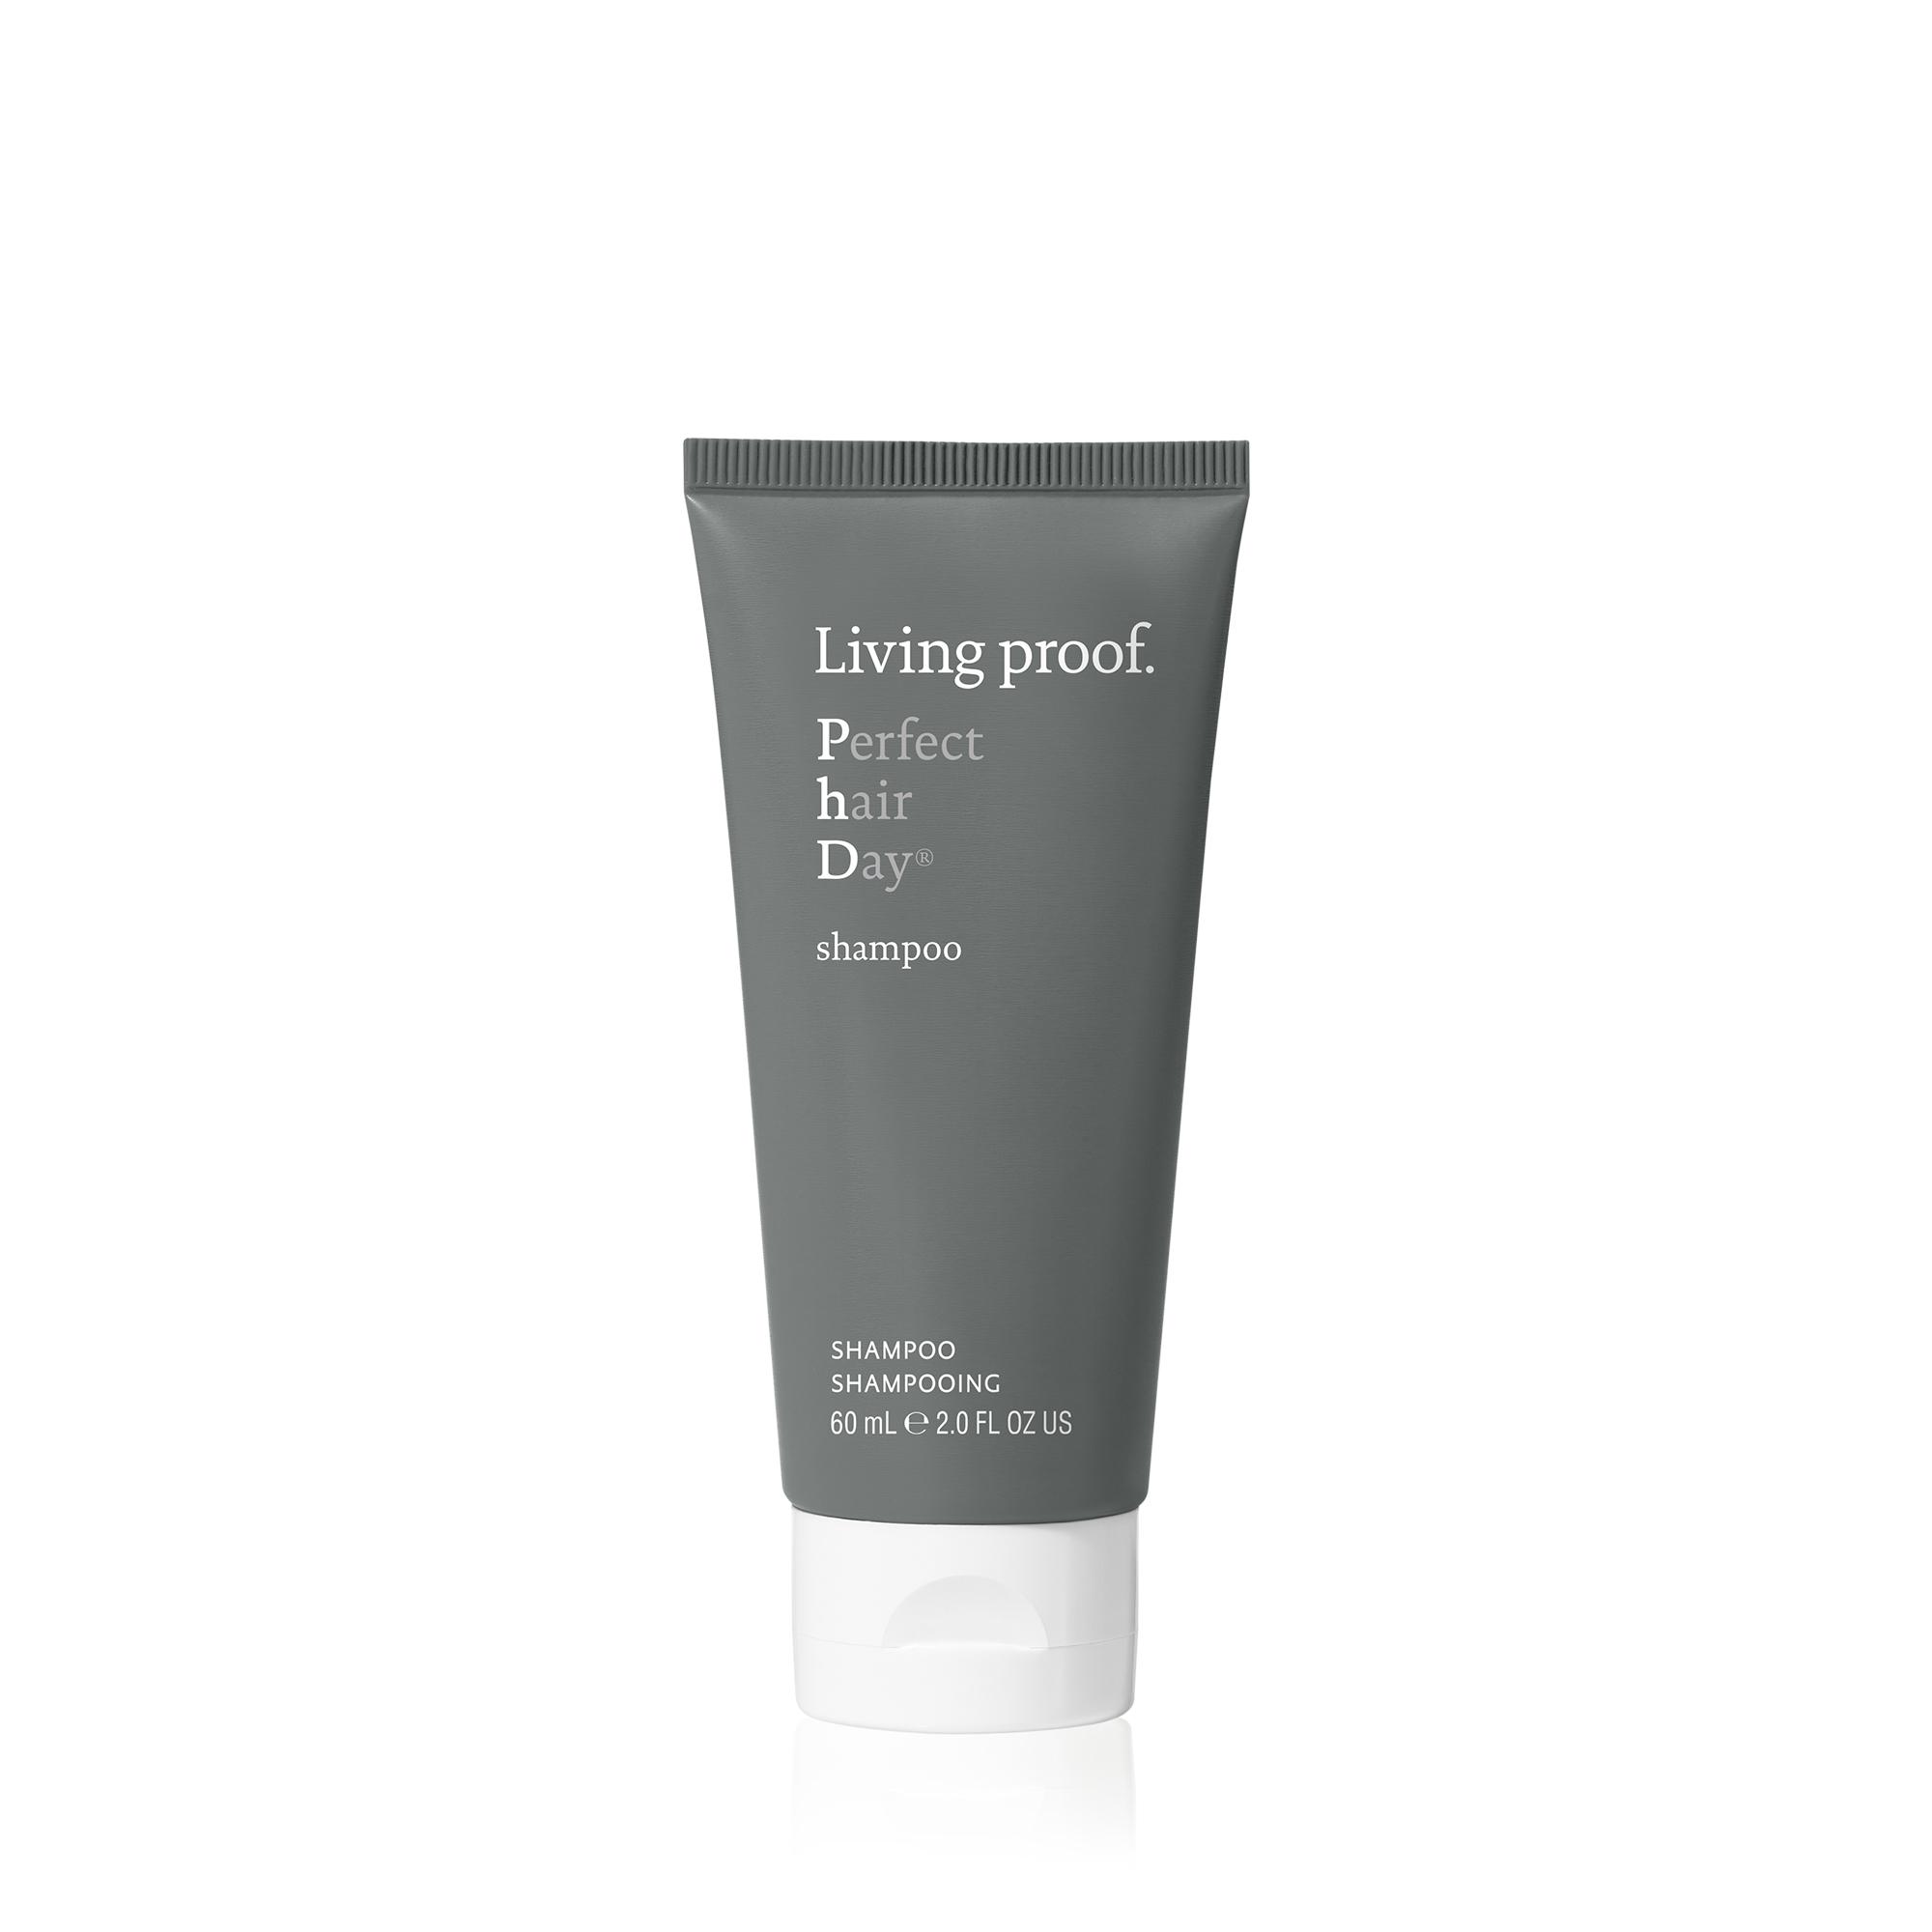 Perfect hair Day (PhD) Shampoo Travel Size